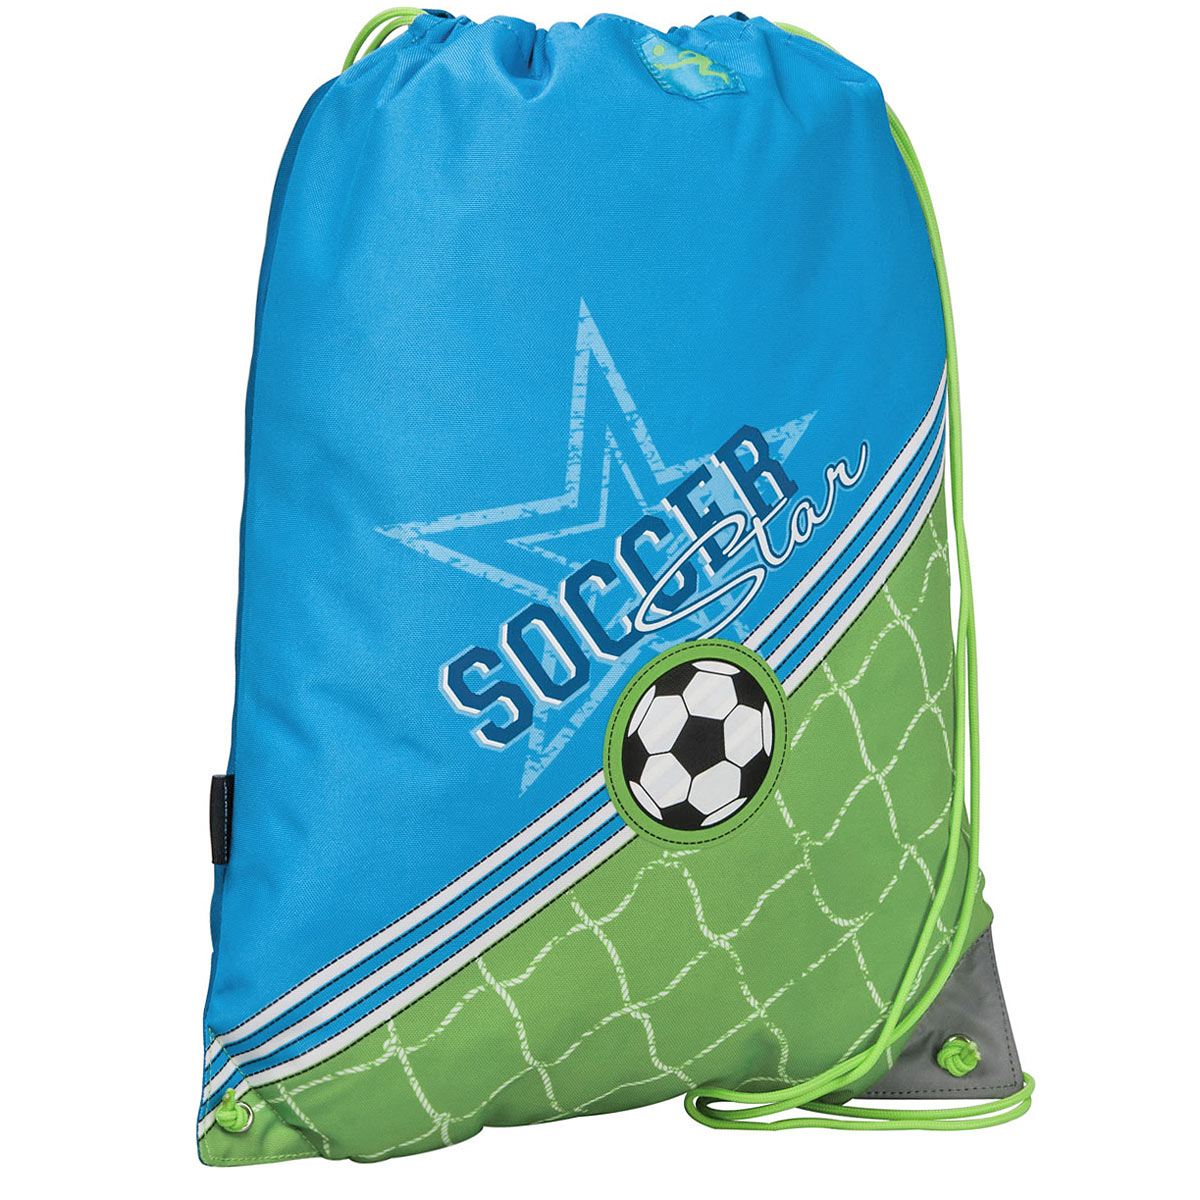 Сумка для сменной обуви Erich Krause Soccer, цвет: голубой, зеленый magic tree house fact tracker 29 soccer